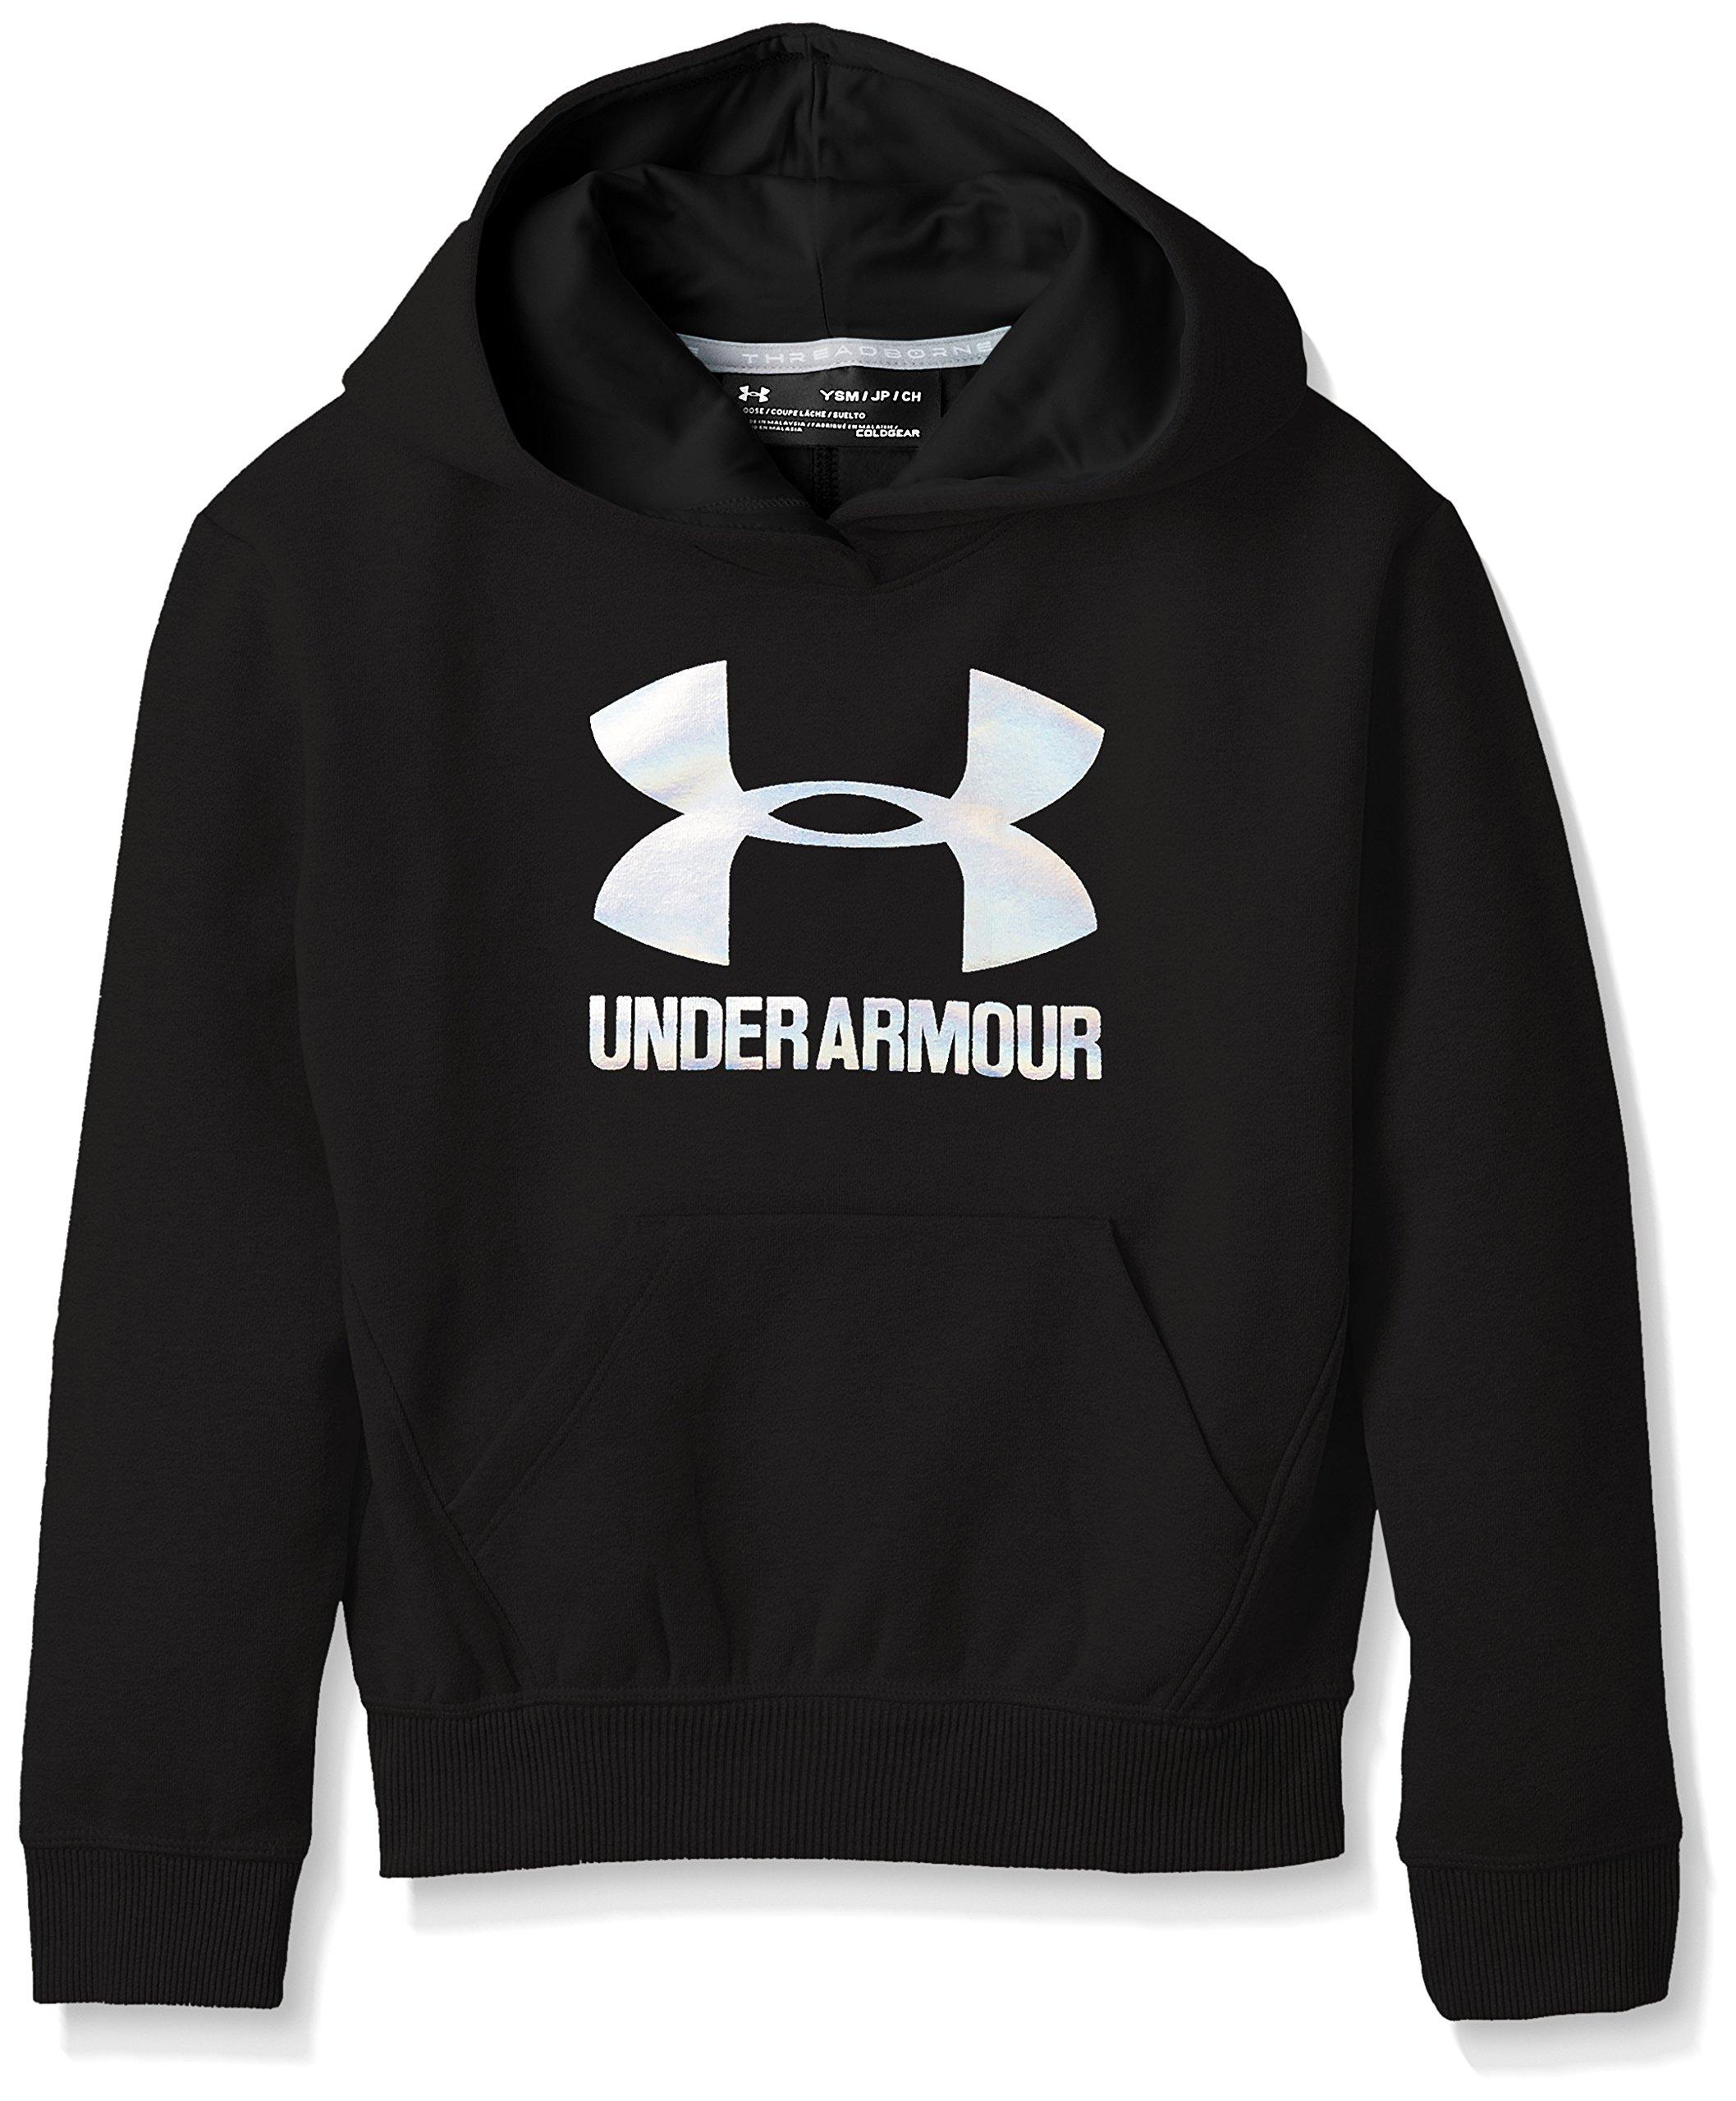 Under Armour Girls Threadborne Fleece Hoodie,Black /Silver, Youth Medium by Under Armour